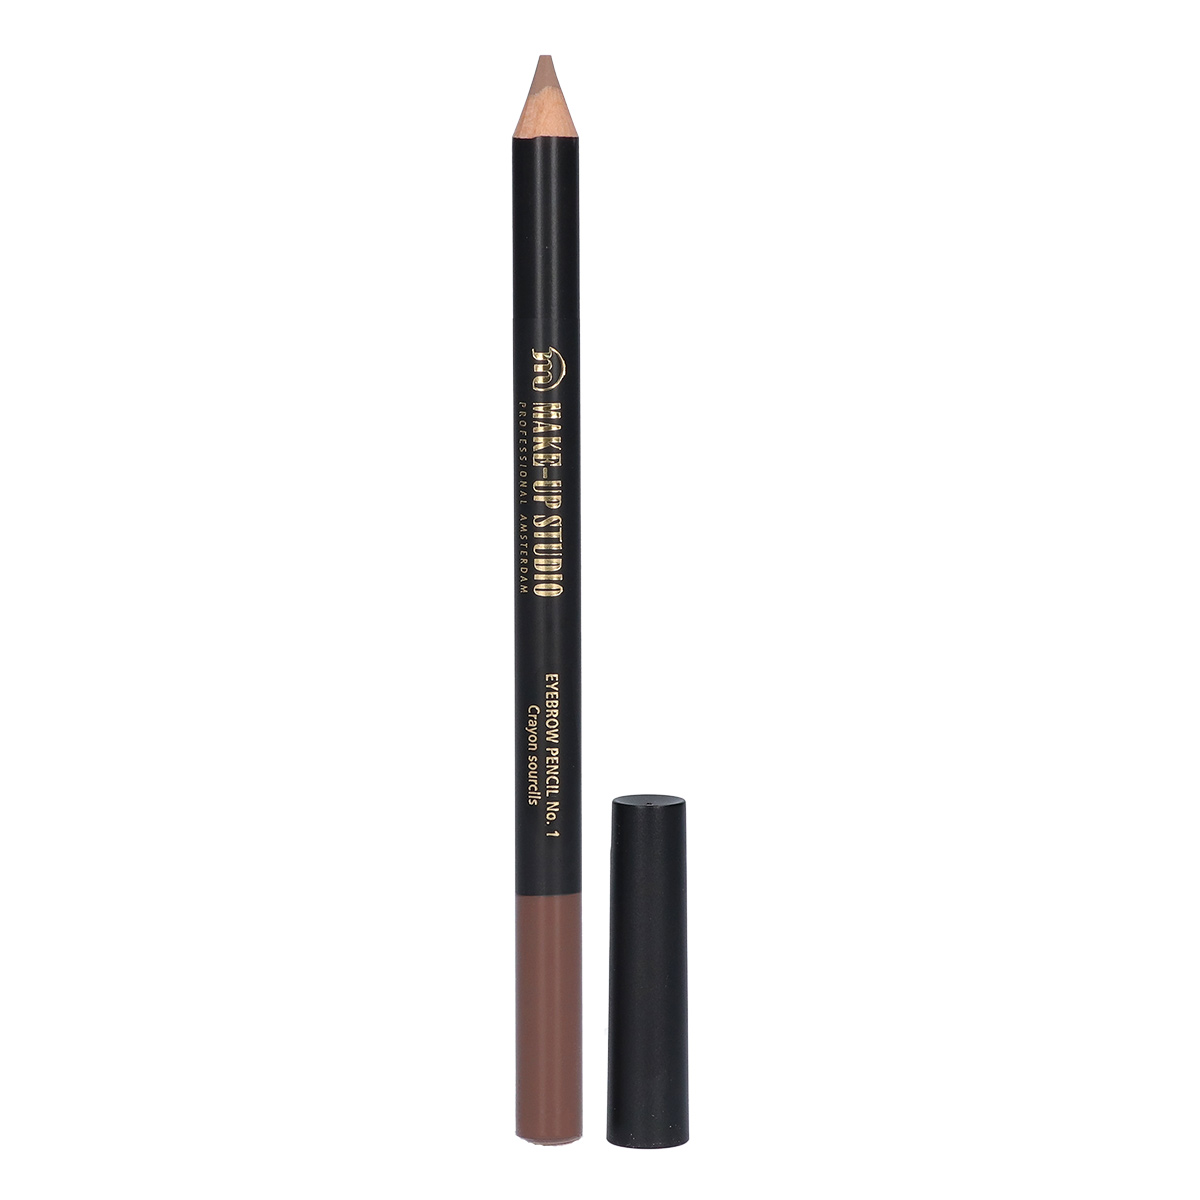 Eyebrow Pencil - 1